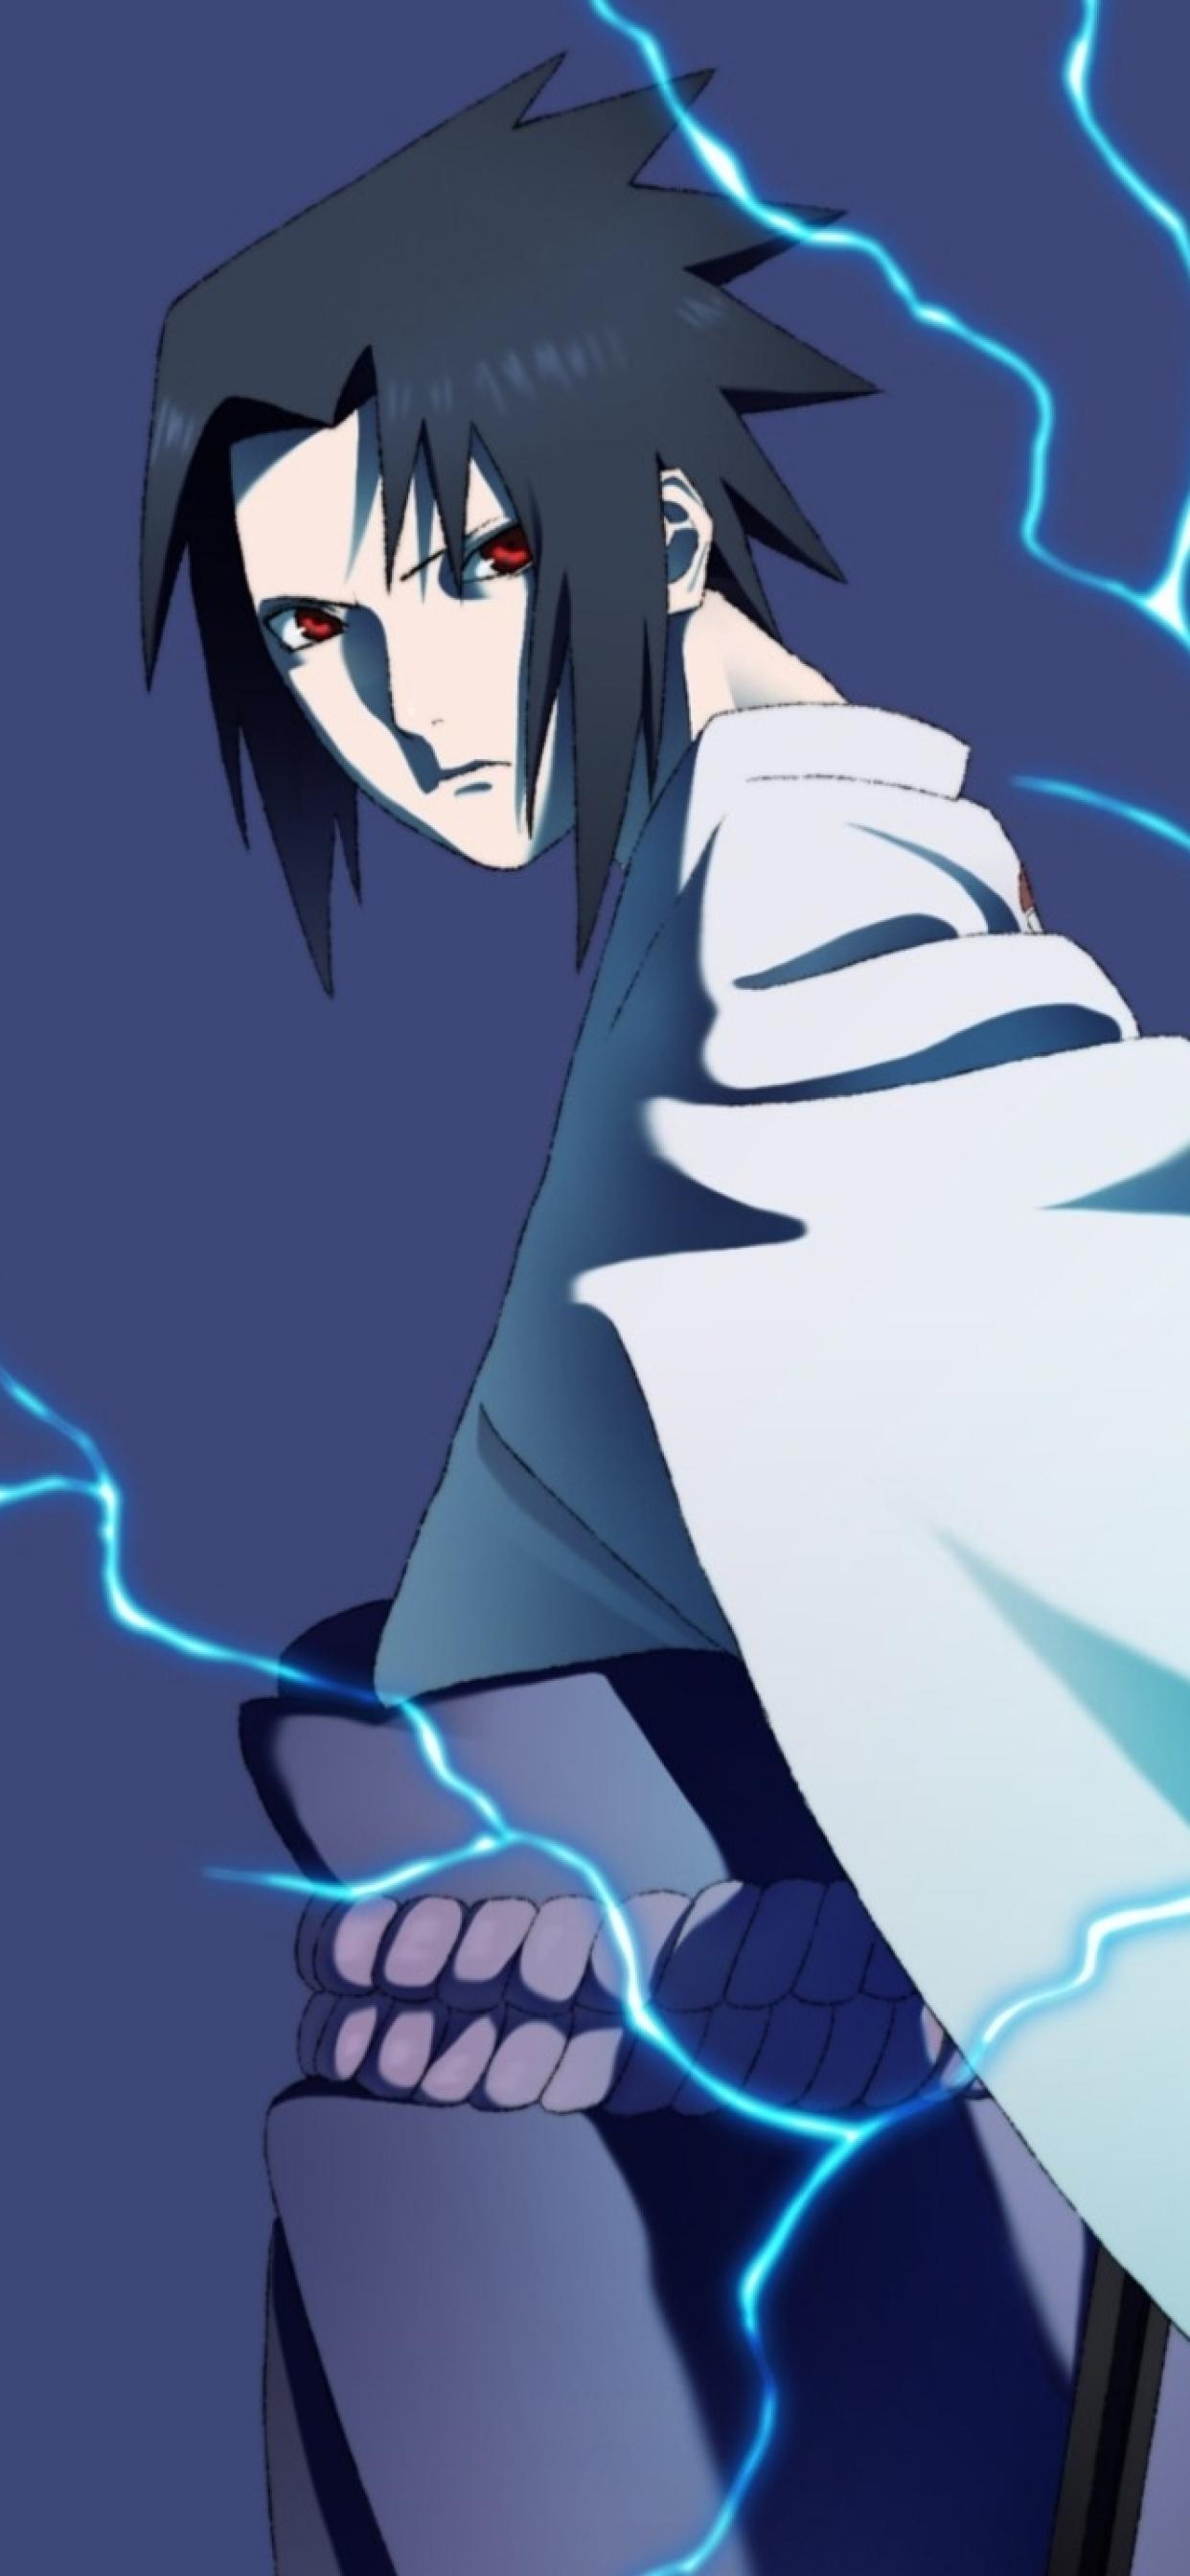 1242x2688 Sasuke Uchiha Anime Art Iphone Xs Max Wallpaper Hd Anime 4k Wallpapers Images Photos And Background